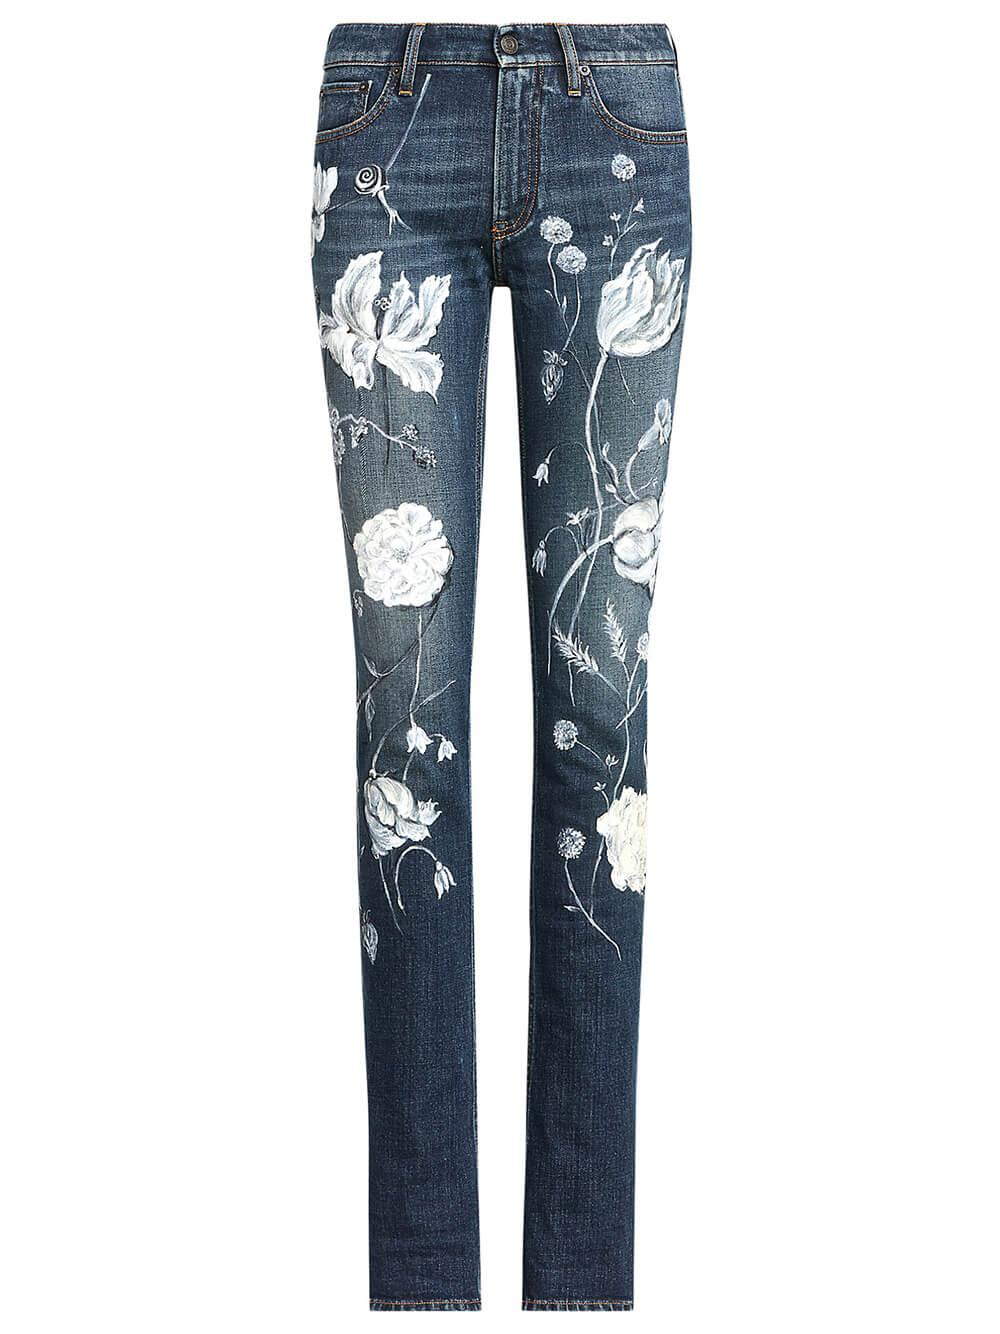 Floral 160 Skinny Jean Item # 290840800001